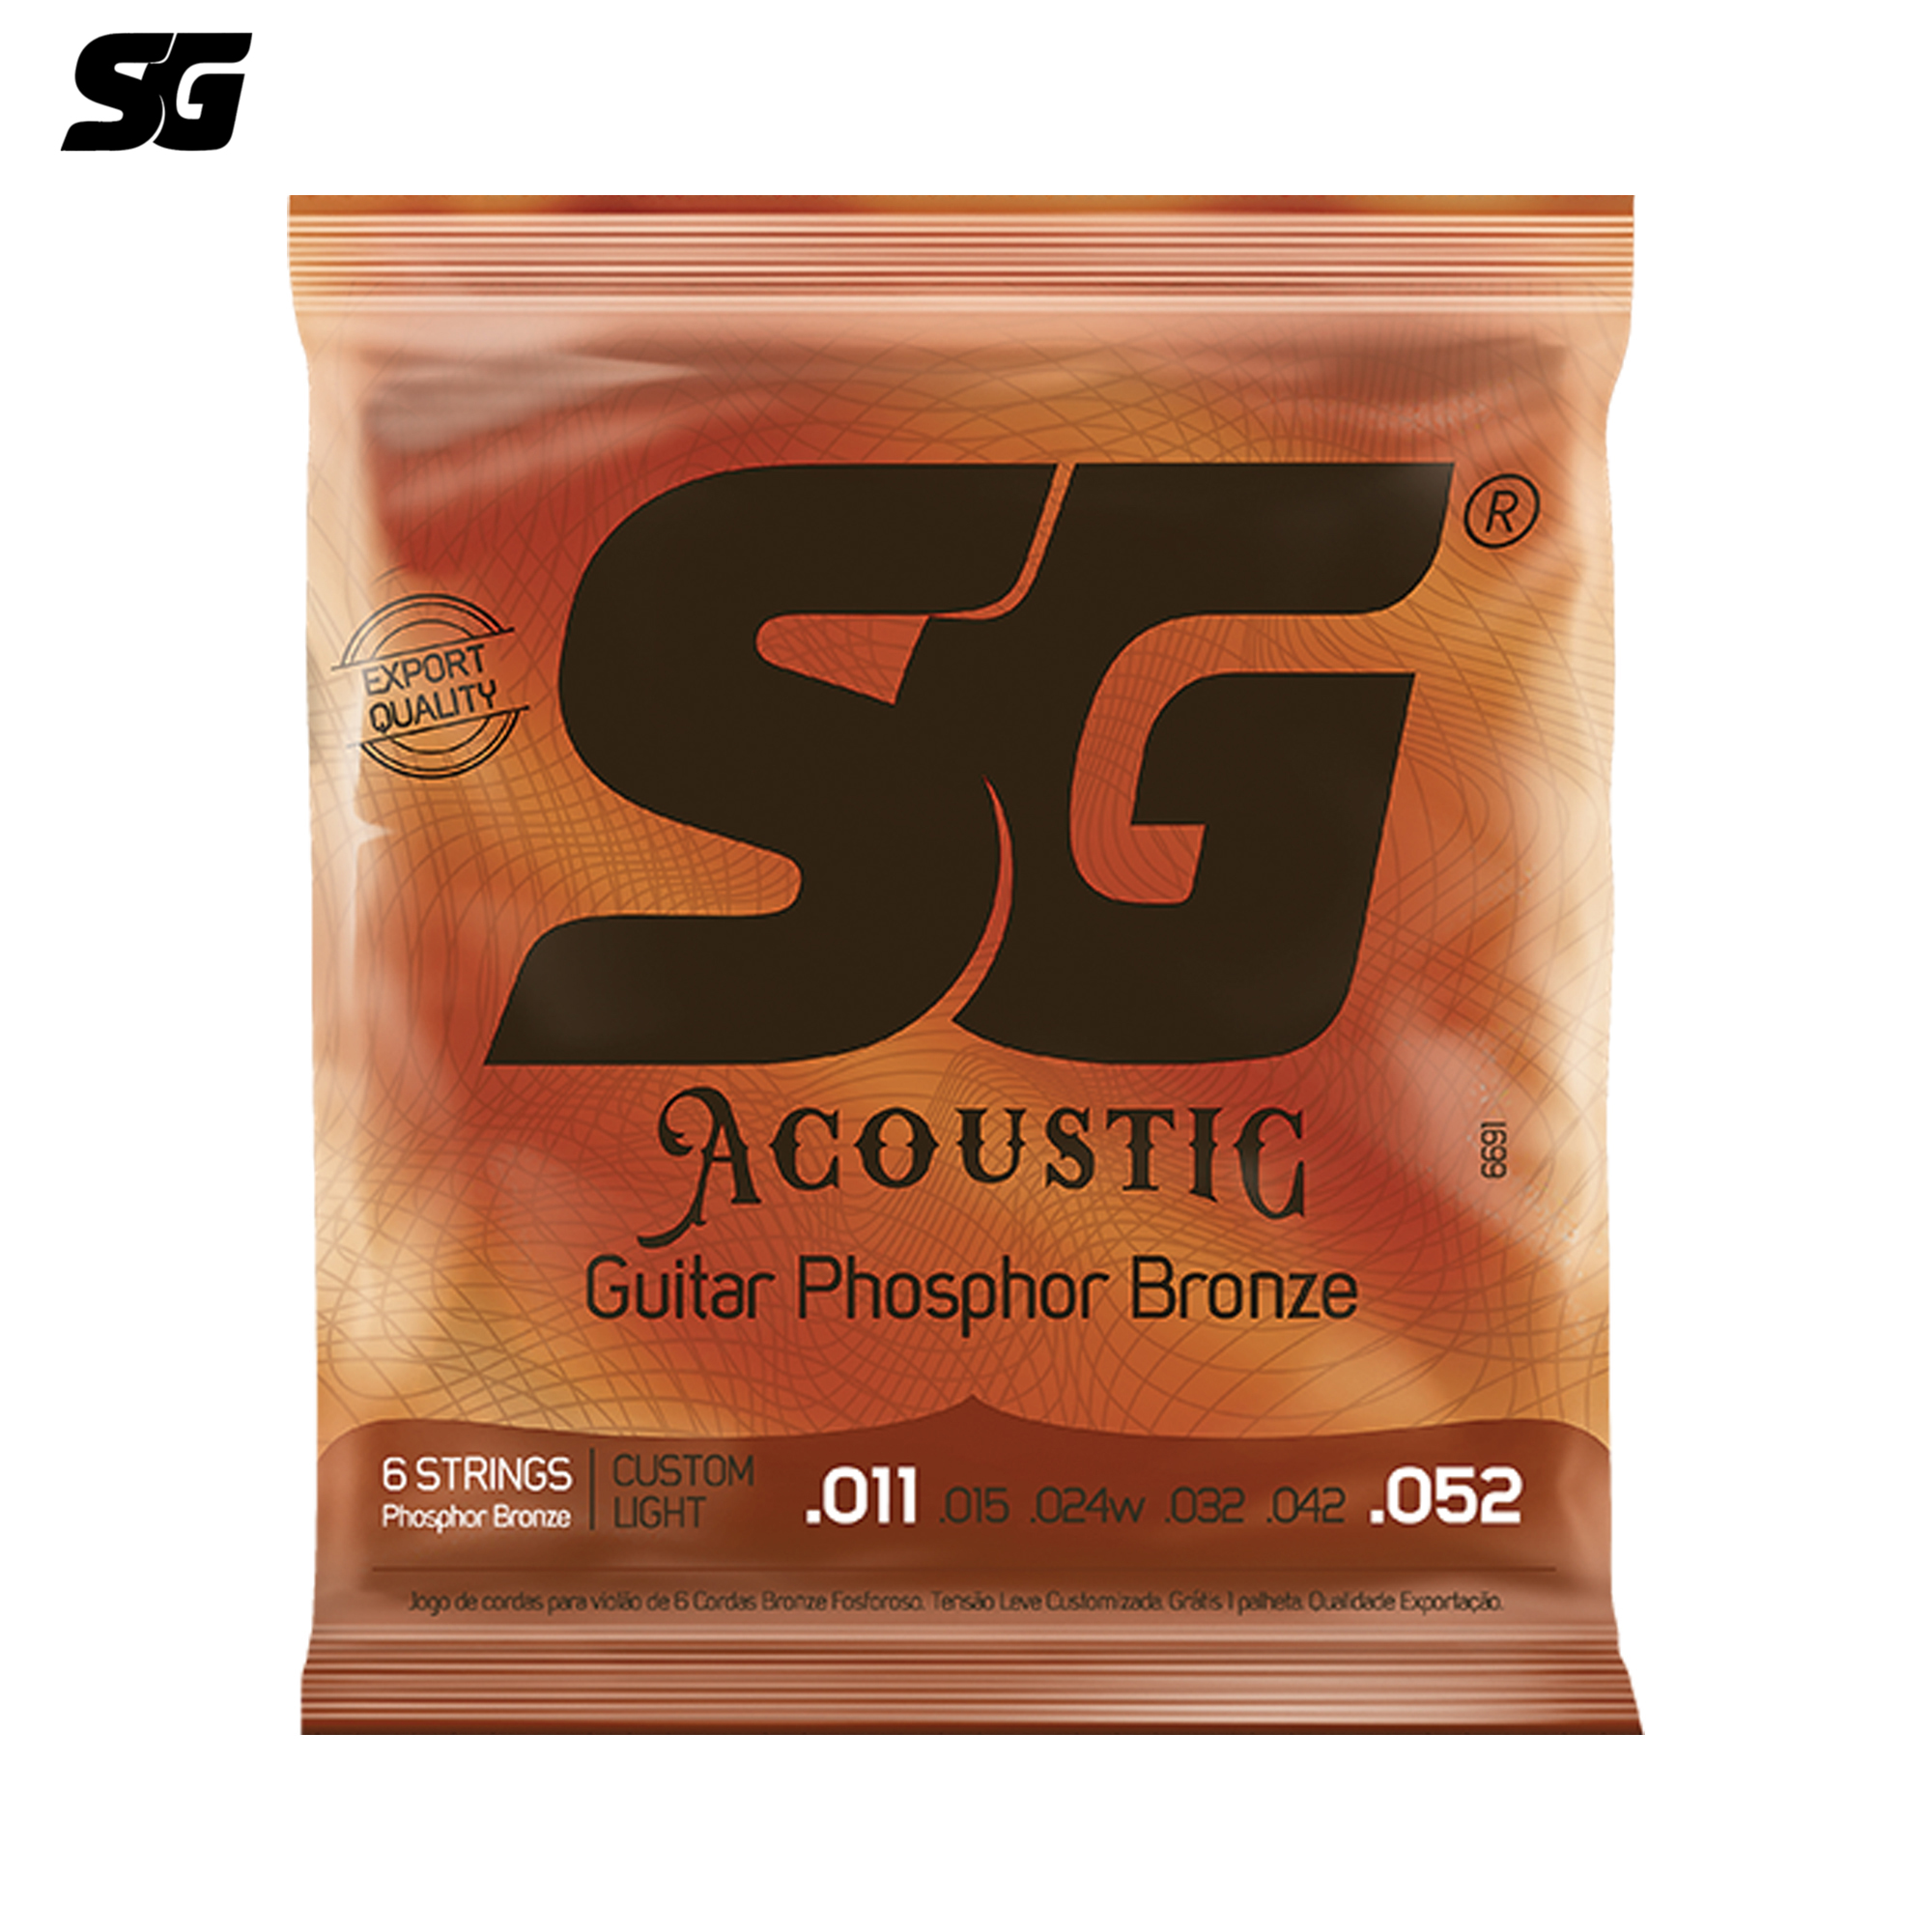 SG Brazil Acoustic Guitar Strings Phosphor Bronze Coating 1pc free Guitar Pick Tinned Steel Hexagonal Core 011-052 inch 6691EX